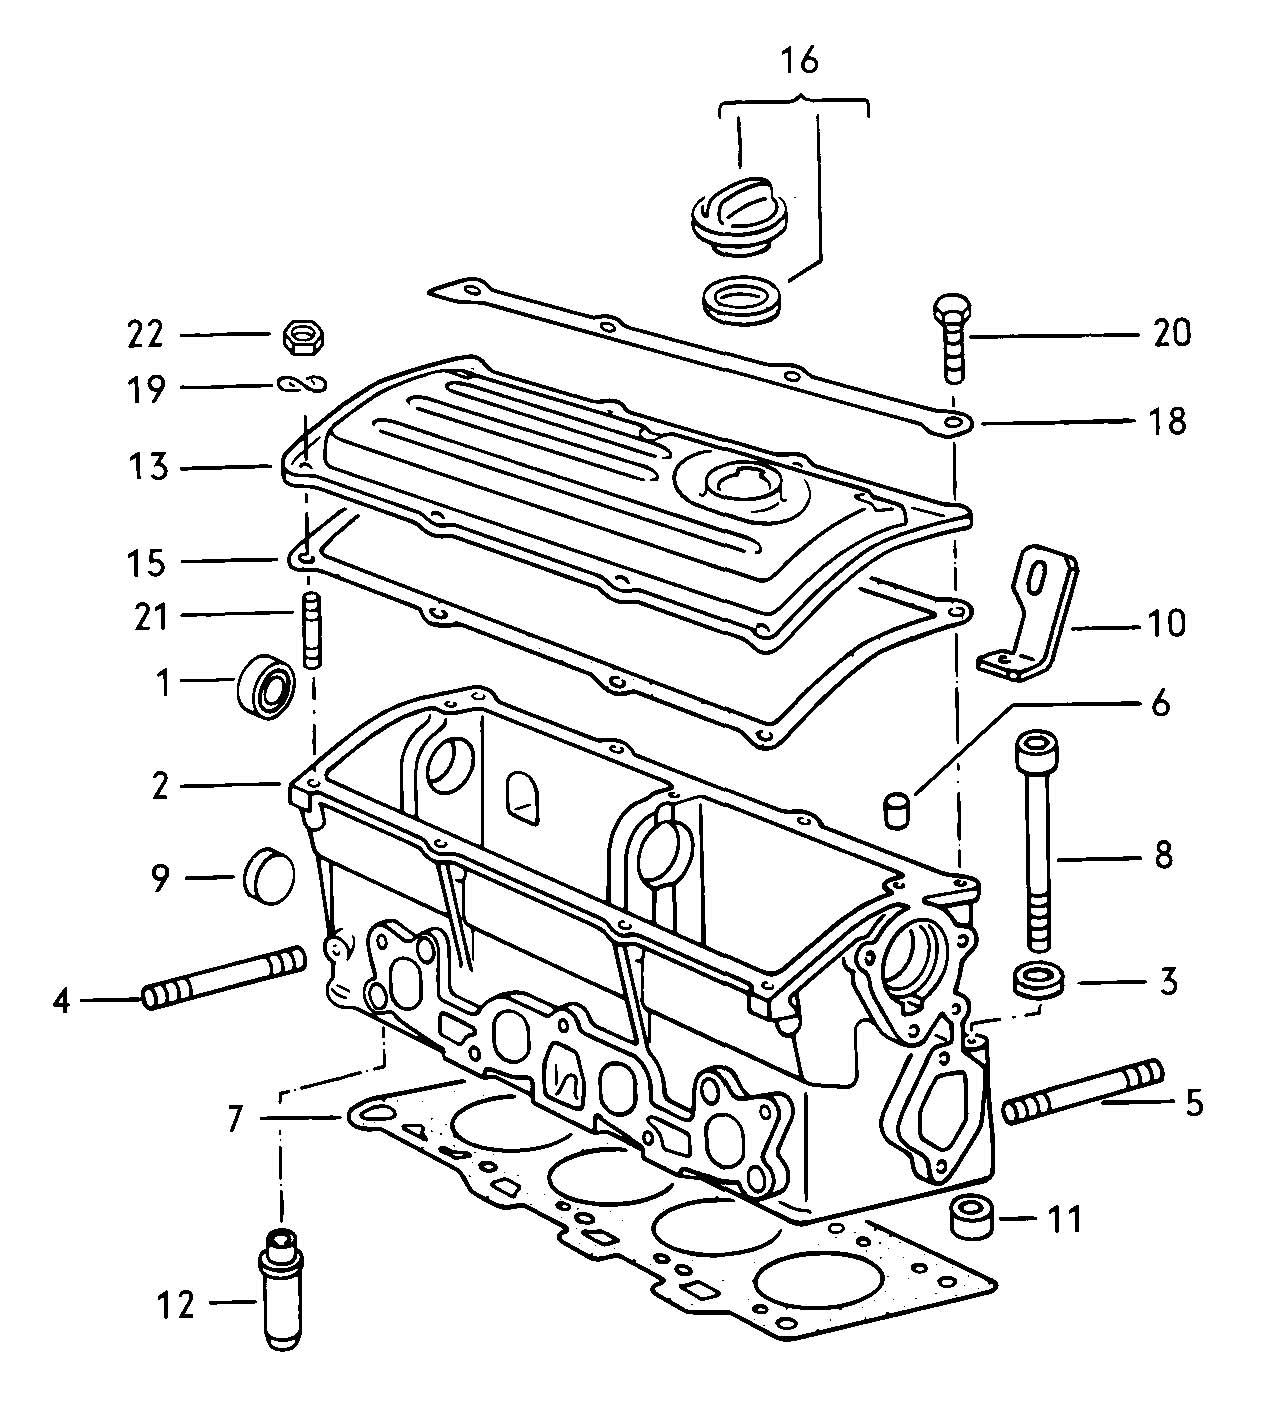 82 chevy truck s10 engine wiring diagram